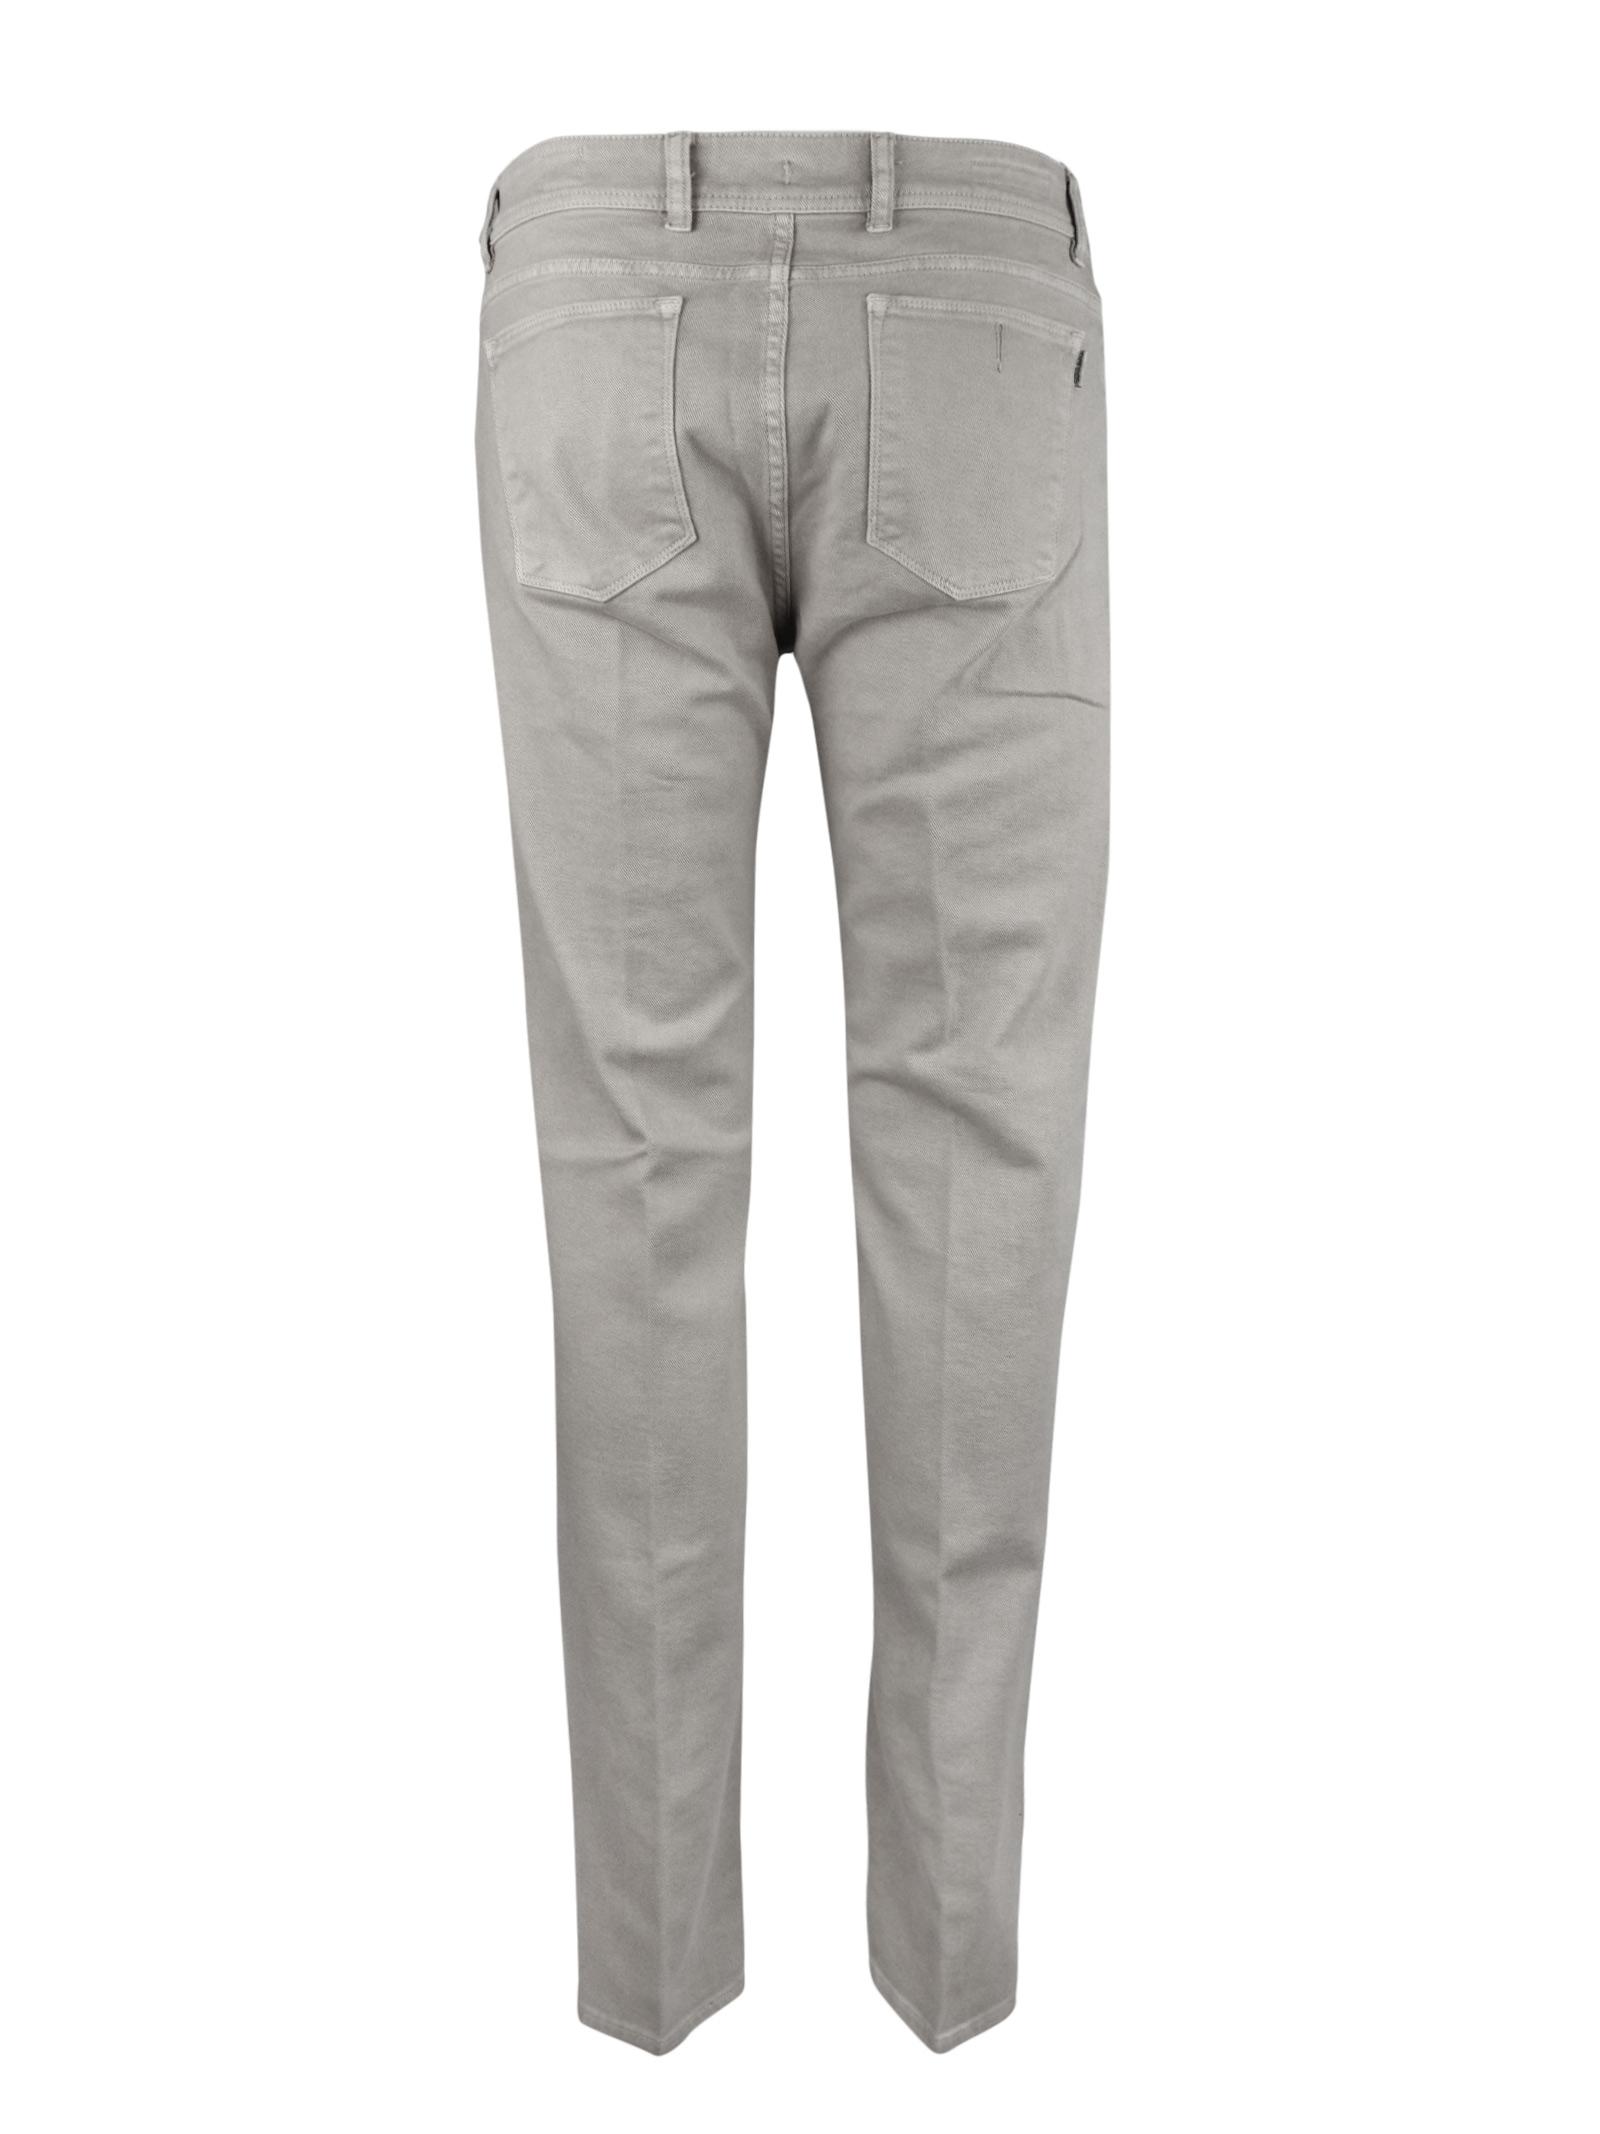 PANTALONI 5 TASCHE IN BULL PIGMENTATO BARMAS | Jeans | DEAN B319 T0335